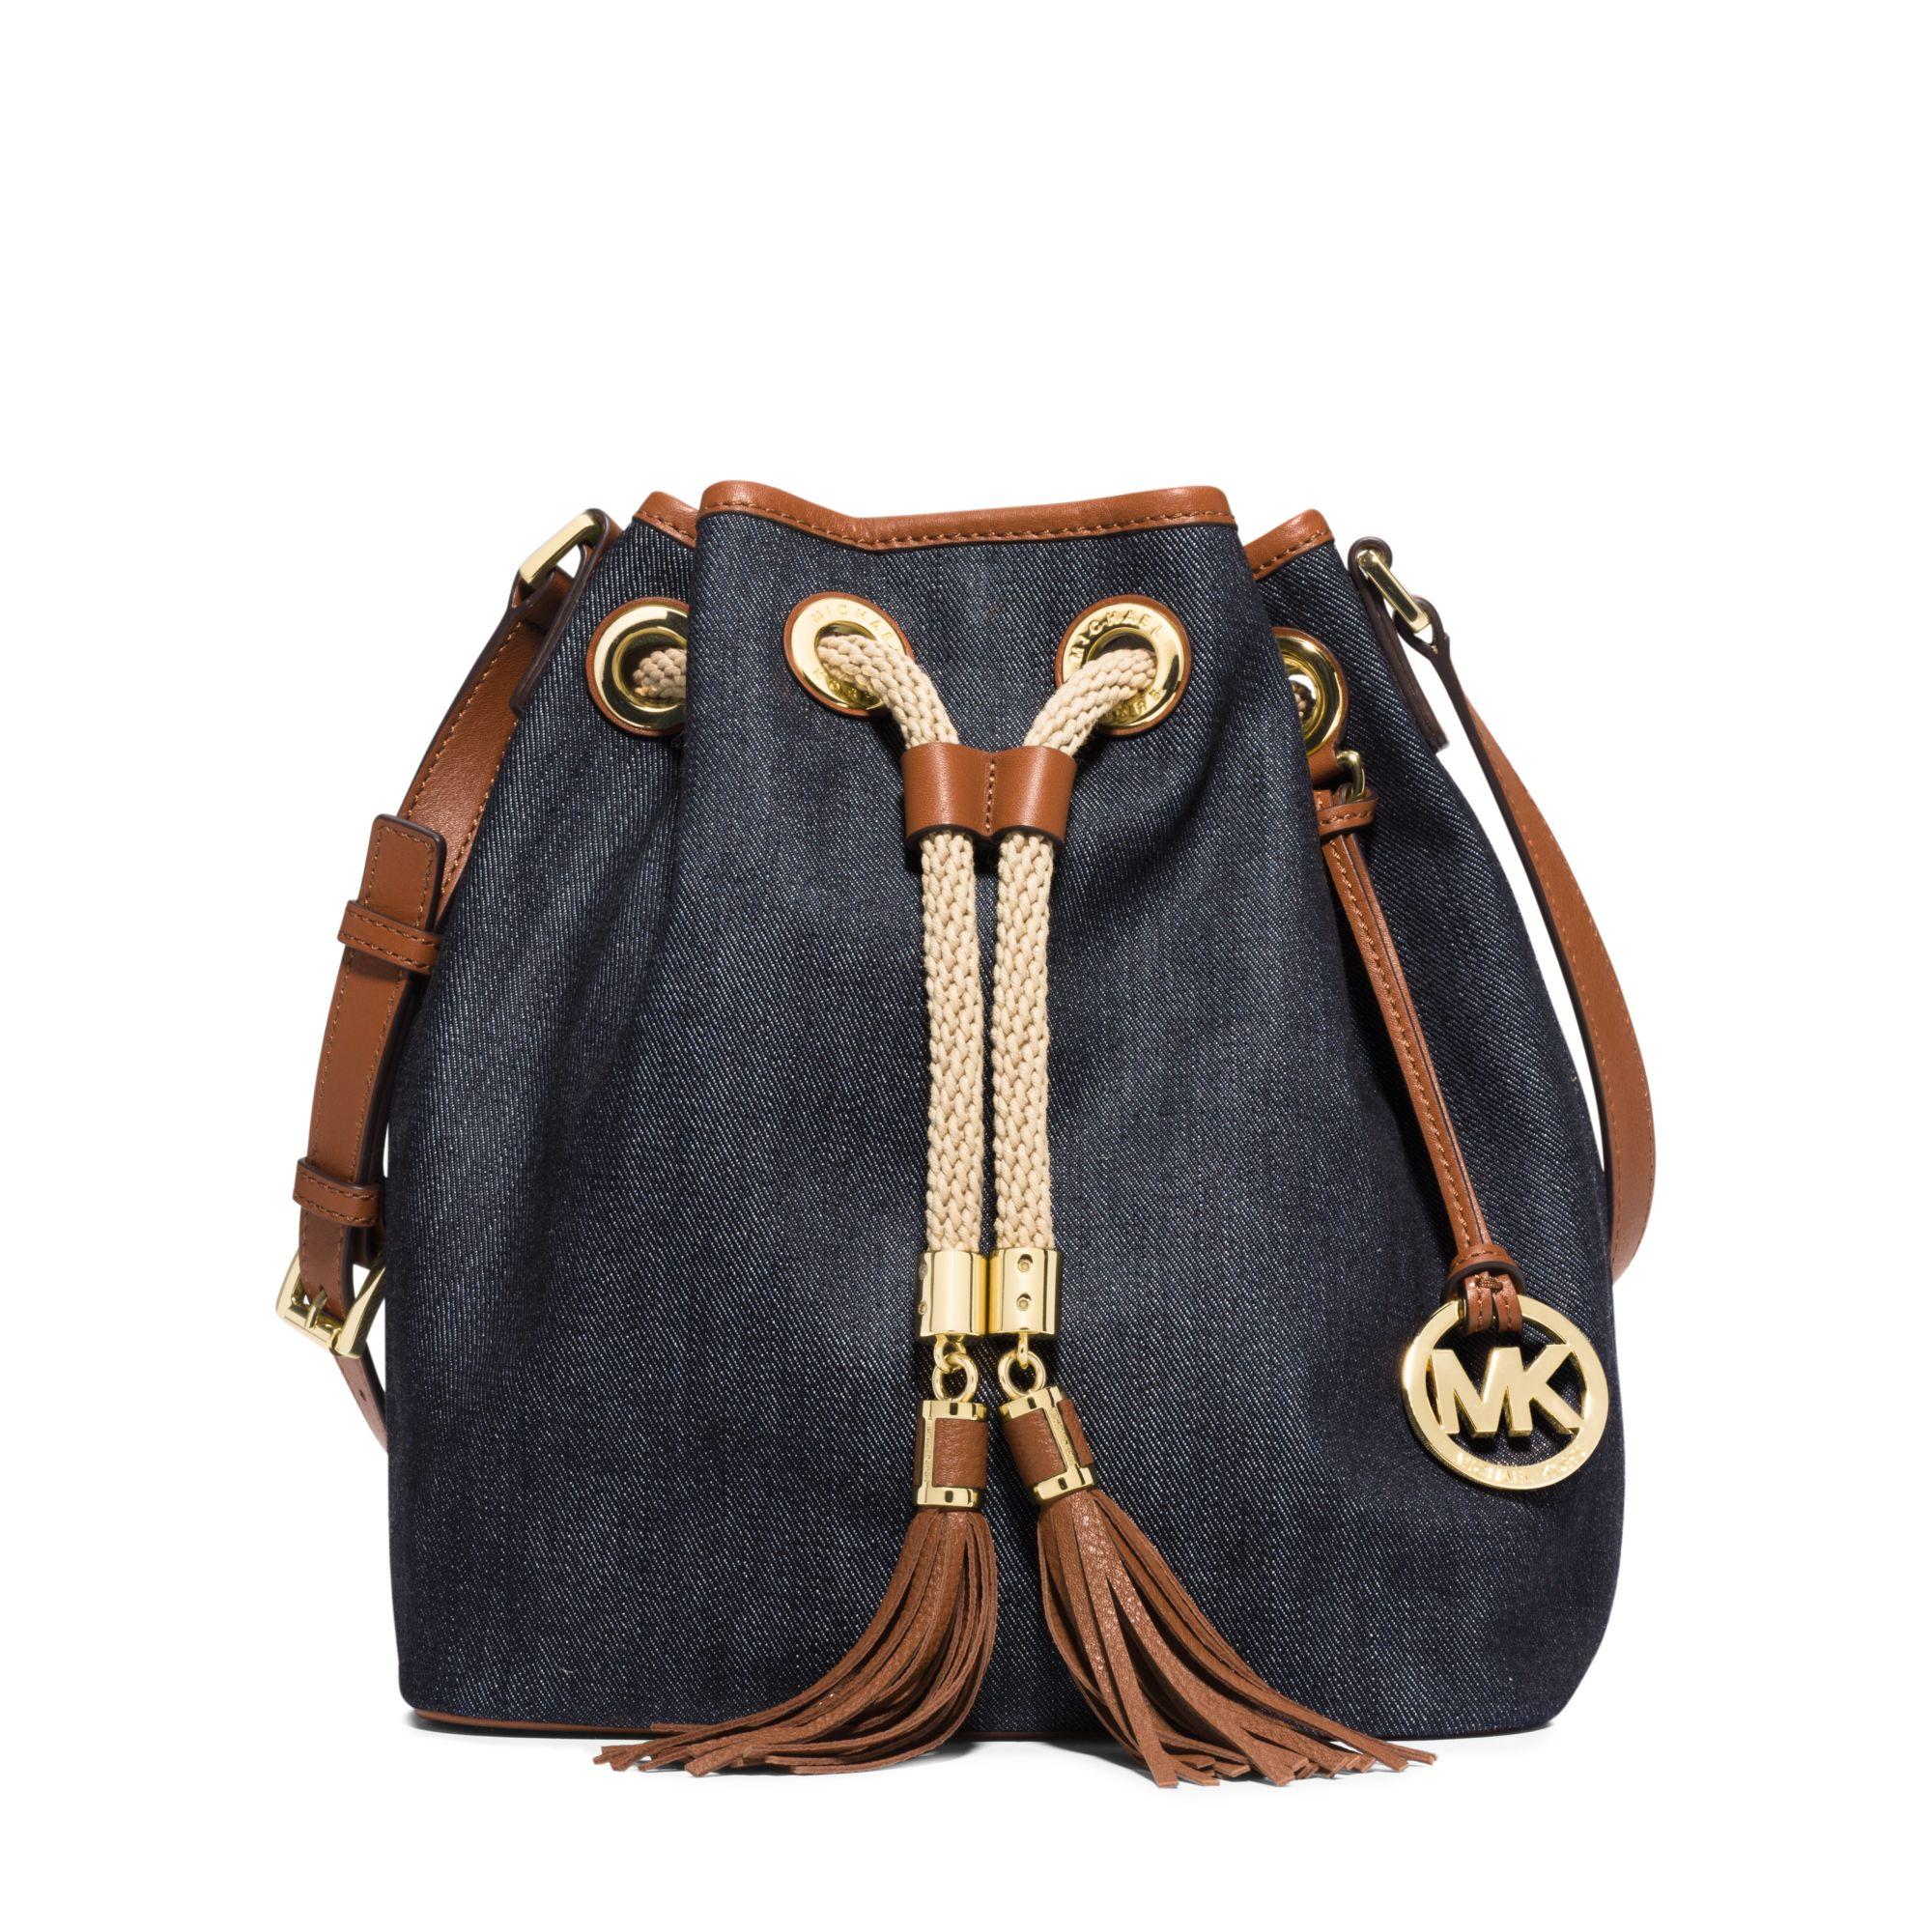 lyst michael kors marina large denim shoulder bag in blue rh lyst com